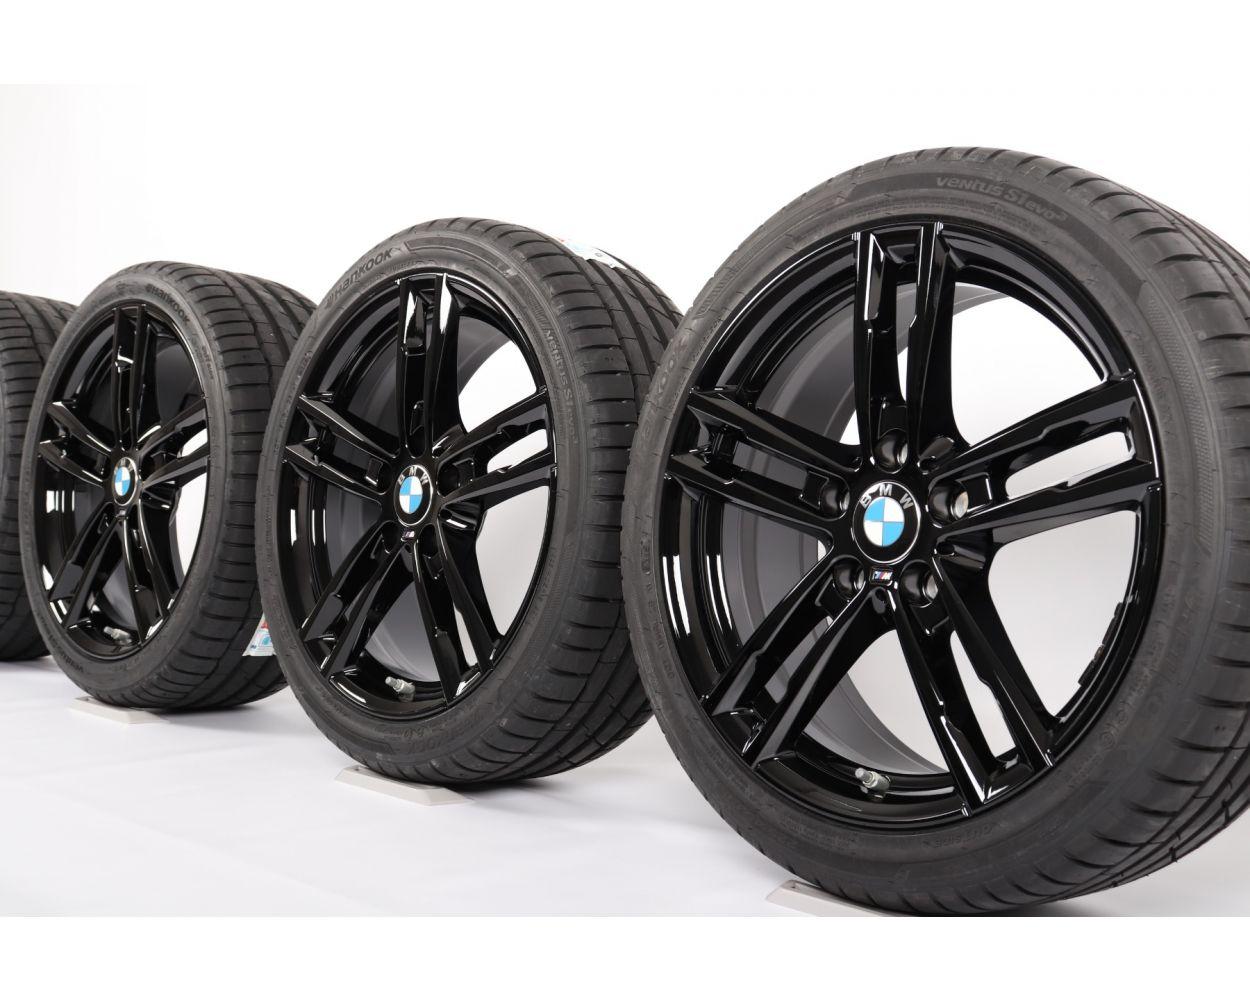 Bmw Summer Wheels 1 Series F20 F21 2 Series F22 F23 18 Inch Styling 719 M